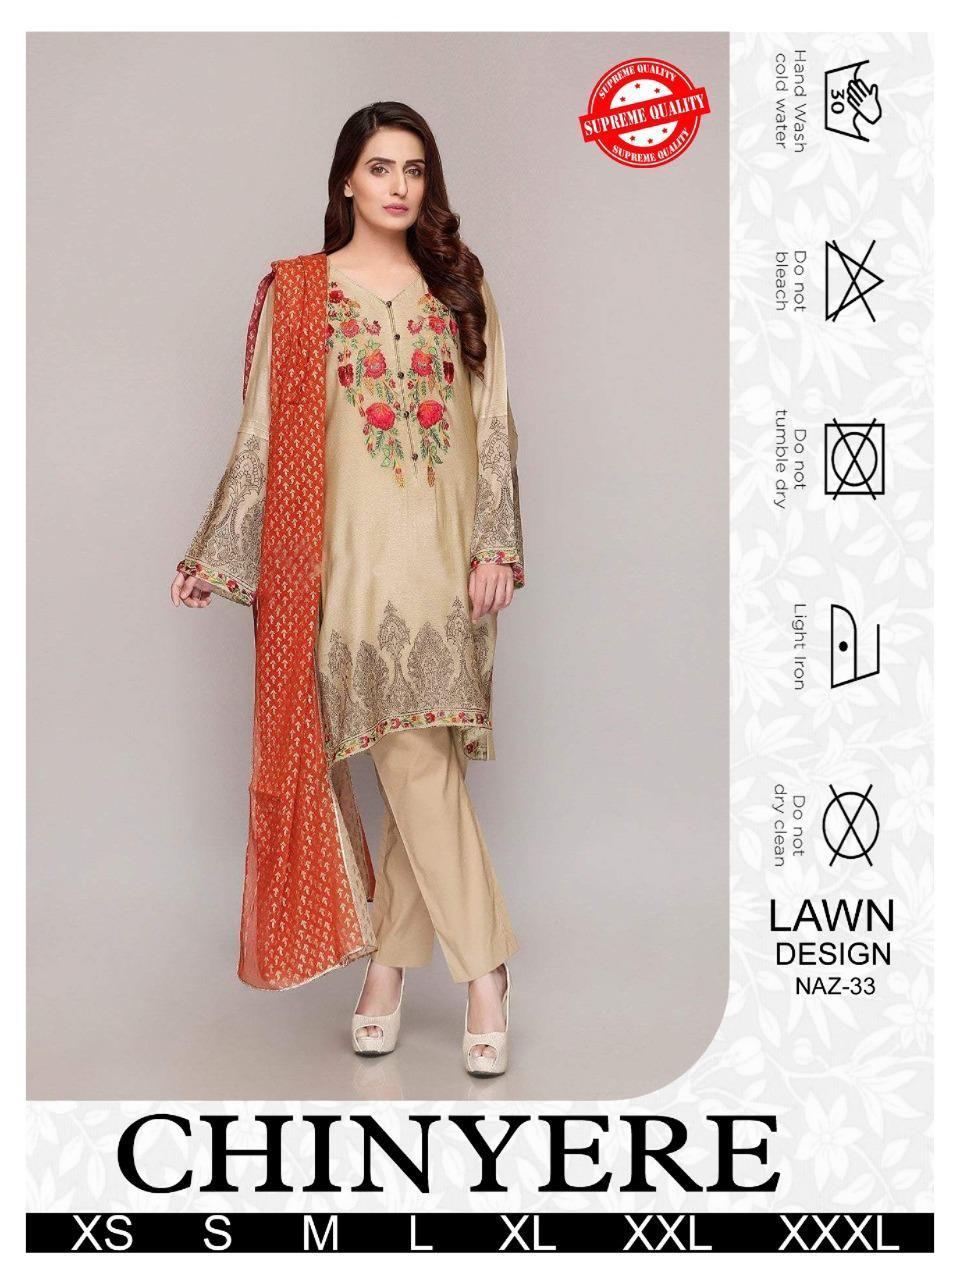 Lawn design collection available..printed shirt and dupatta.for more information you can dm me  #fashionstyle #karachifashion #karachi #karachistyle  #lawn #emboridery #pakistan #pakistanioutfitdresses #pakistanifashion #pakistankarachi  #printed #pakistanidesigner #pakistanioutfits #karachites #karachiites #pakistanlookbook #pakistanidesigners  #pakistanidress  #chinyere #karachifashion #newlawn #branded #pakistanioutfitdresses #pakistanigirls  #hijabers #newstyle #karachistyle